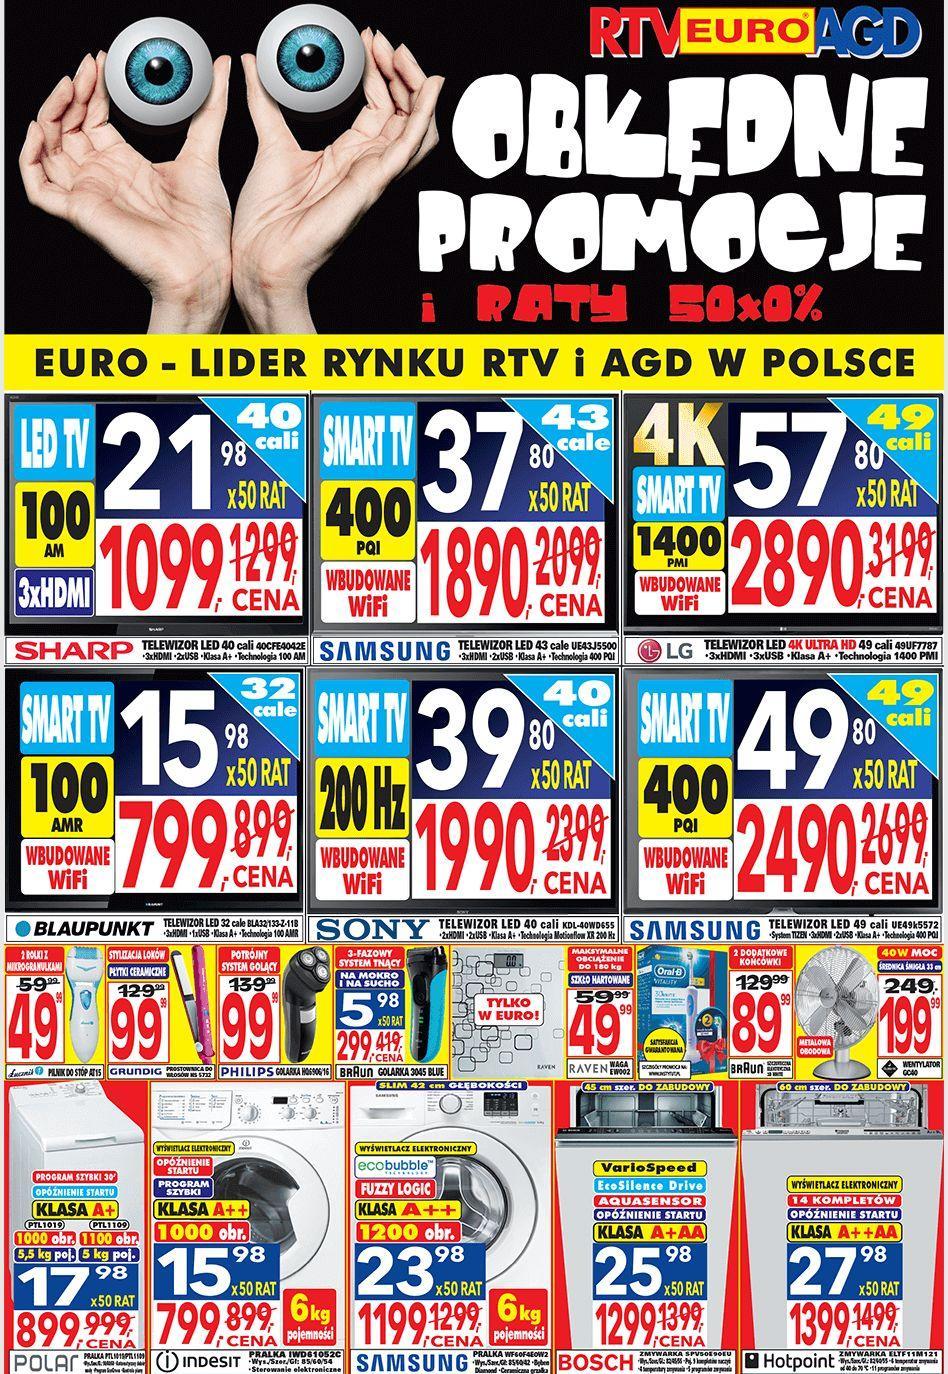 Gazetka promocyjna RTV Euro AGD do 22/07/2016 str.0